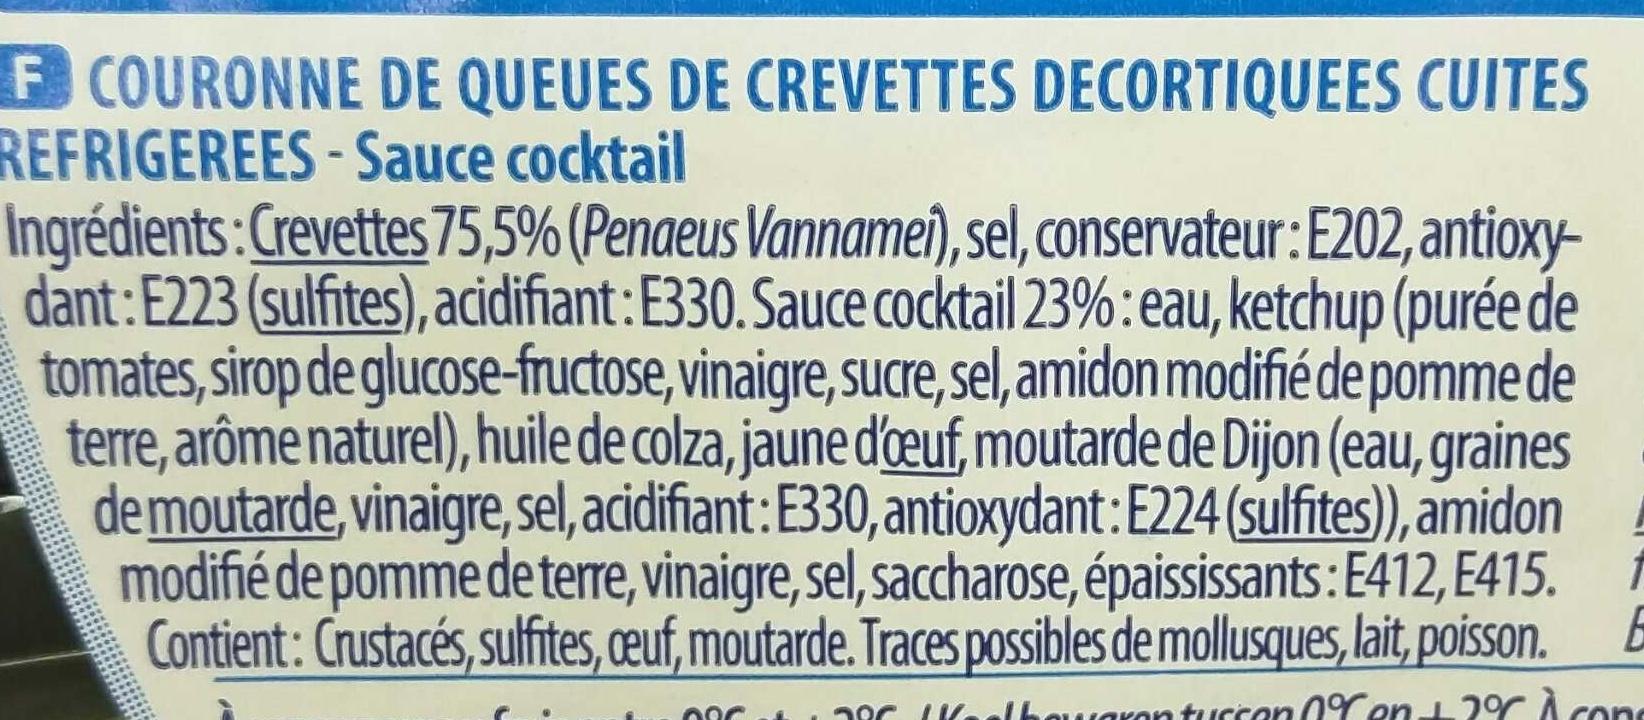 Couronne de Crevettes + Sauce Cocktail - Ingrediënten - fr